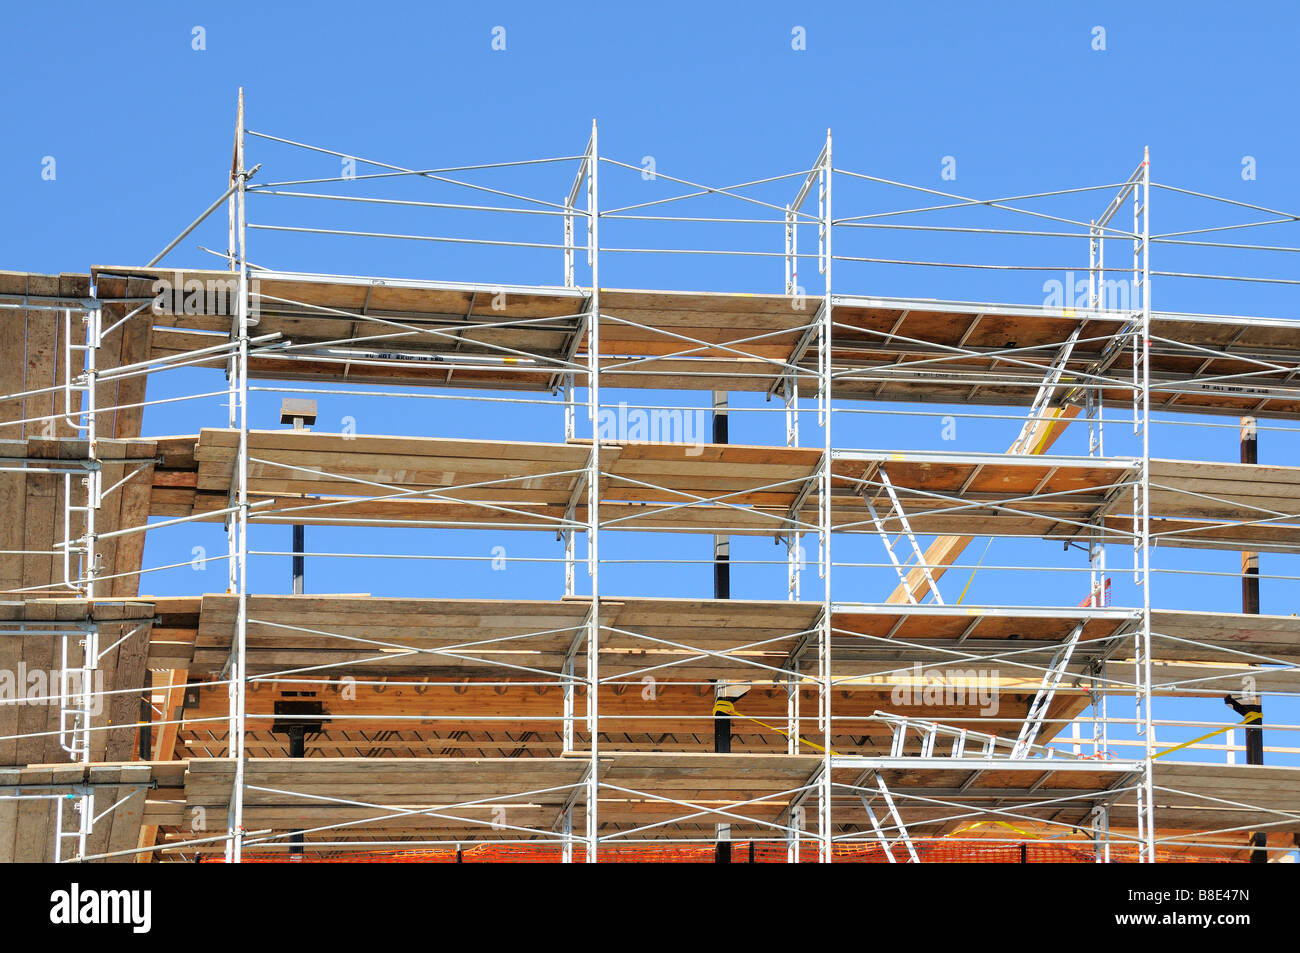 New Construction Scaffolding - Stock Image